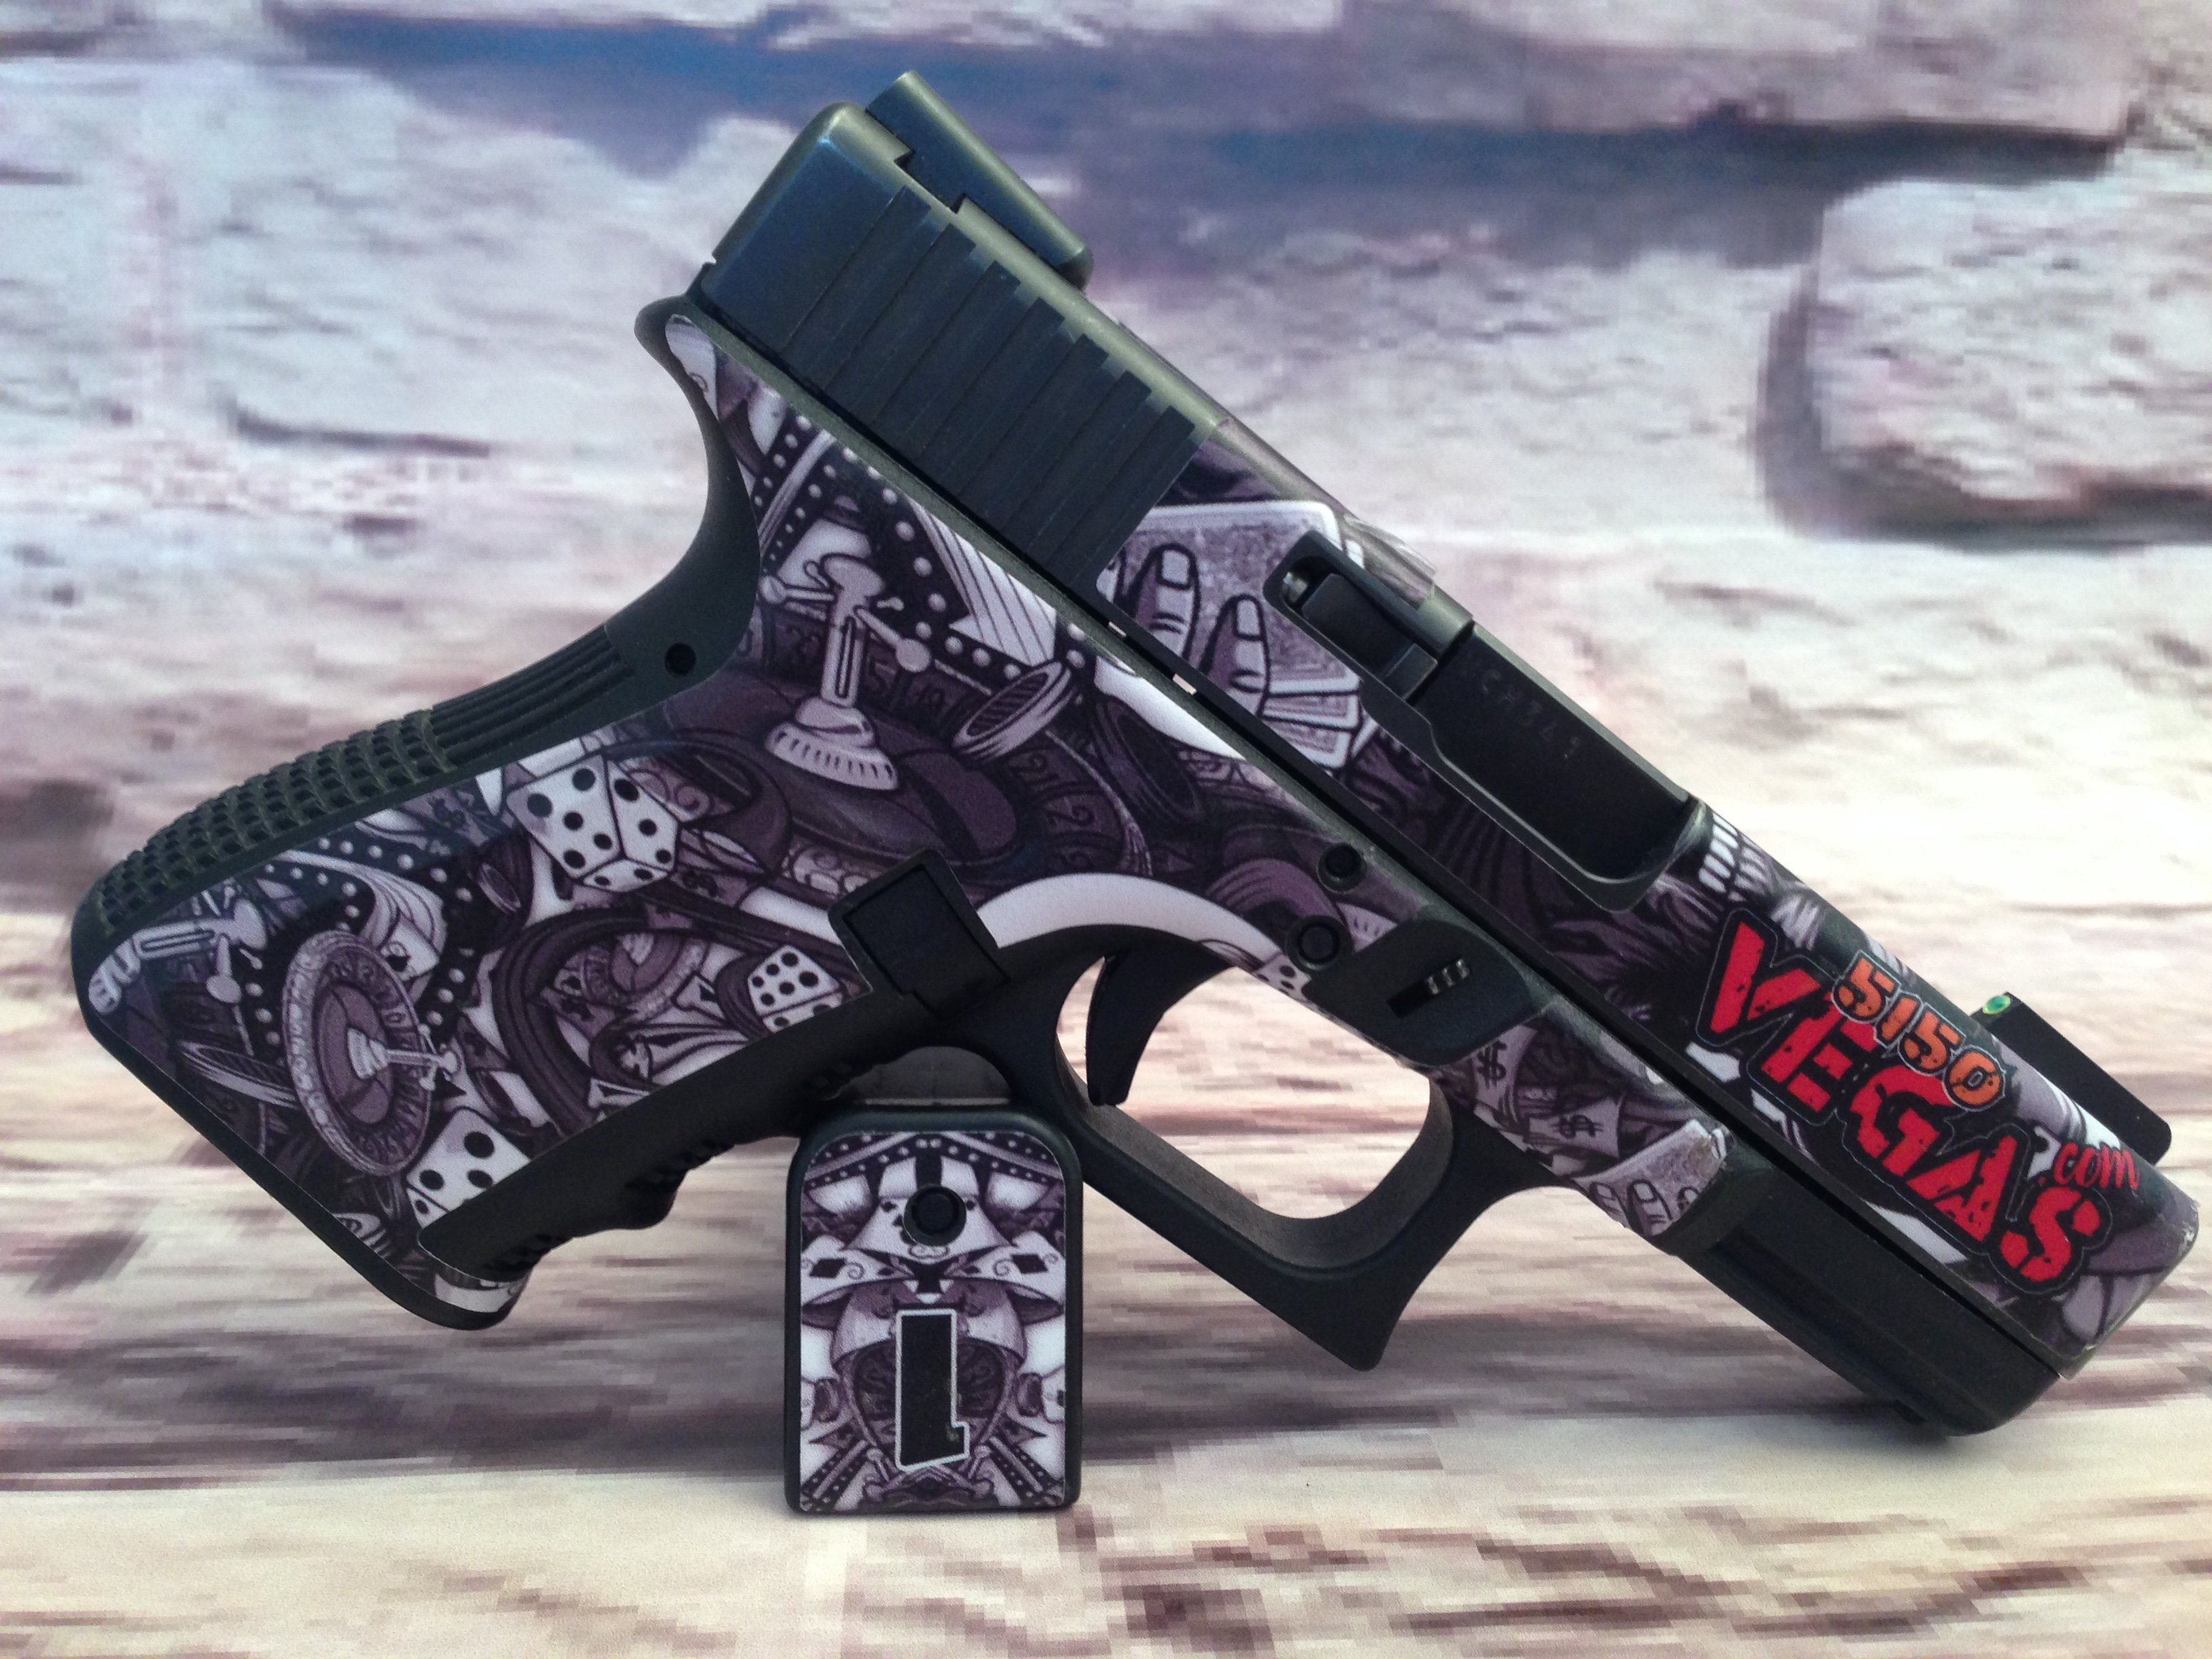 Custom Gun Wrap For Glock 19 Gen 3 High Caliber Graphix